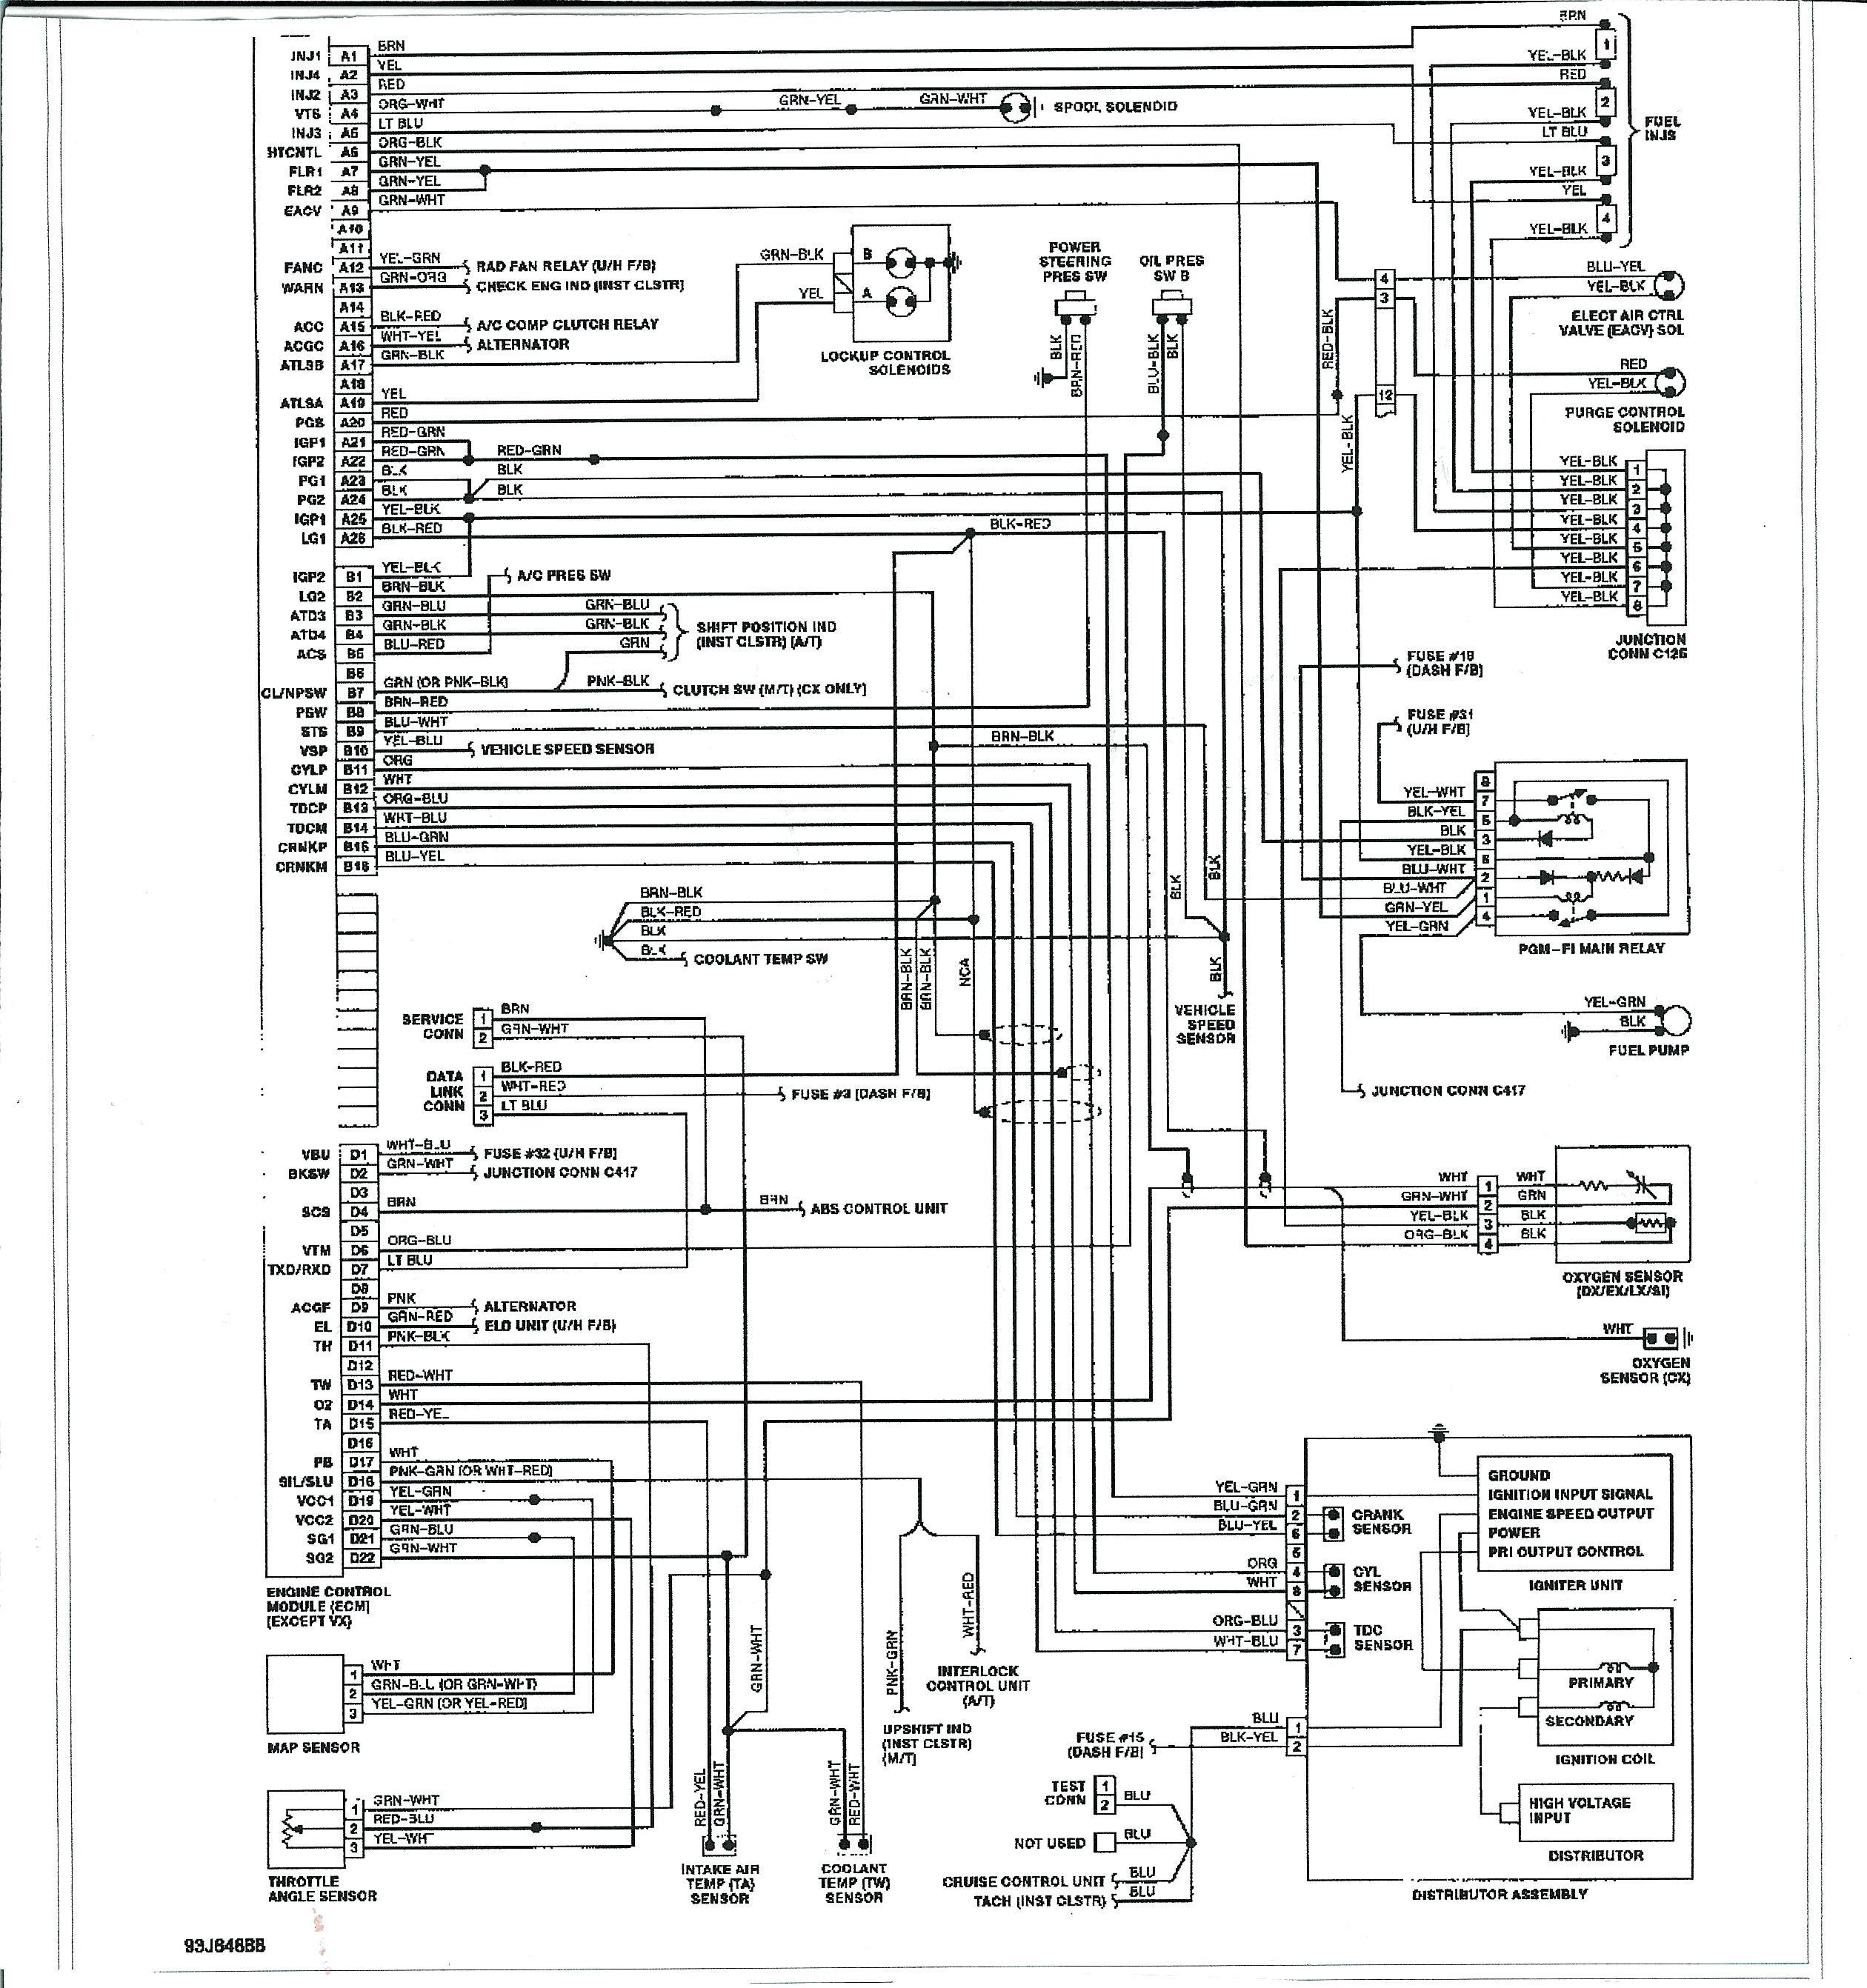 2007 gmc sierra 2500hd wiring diagram